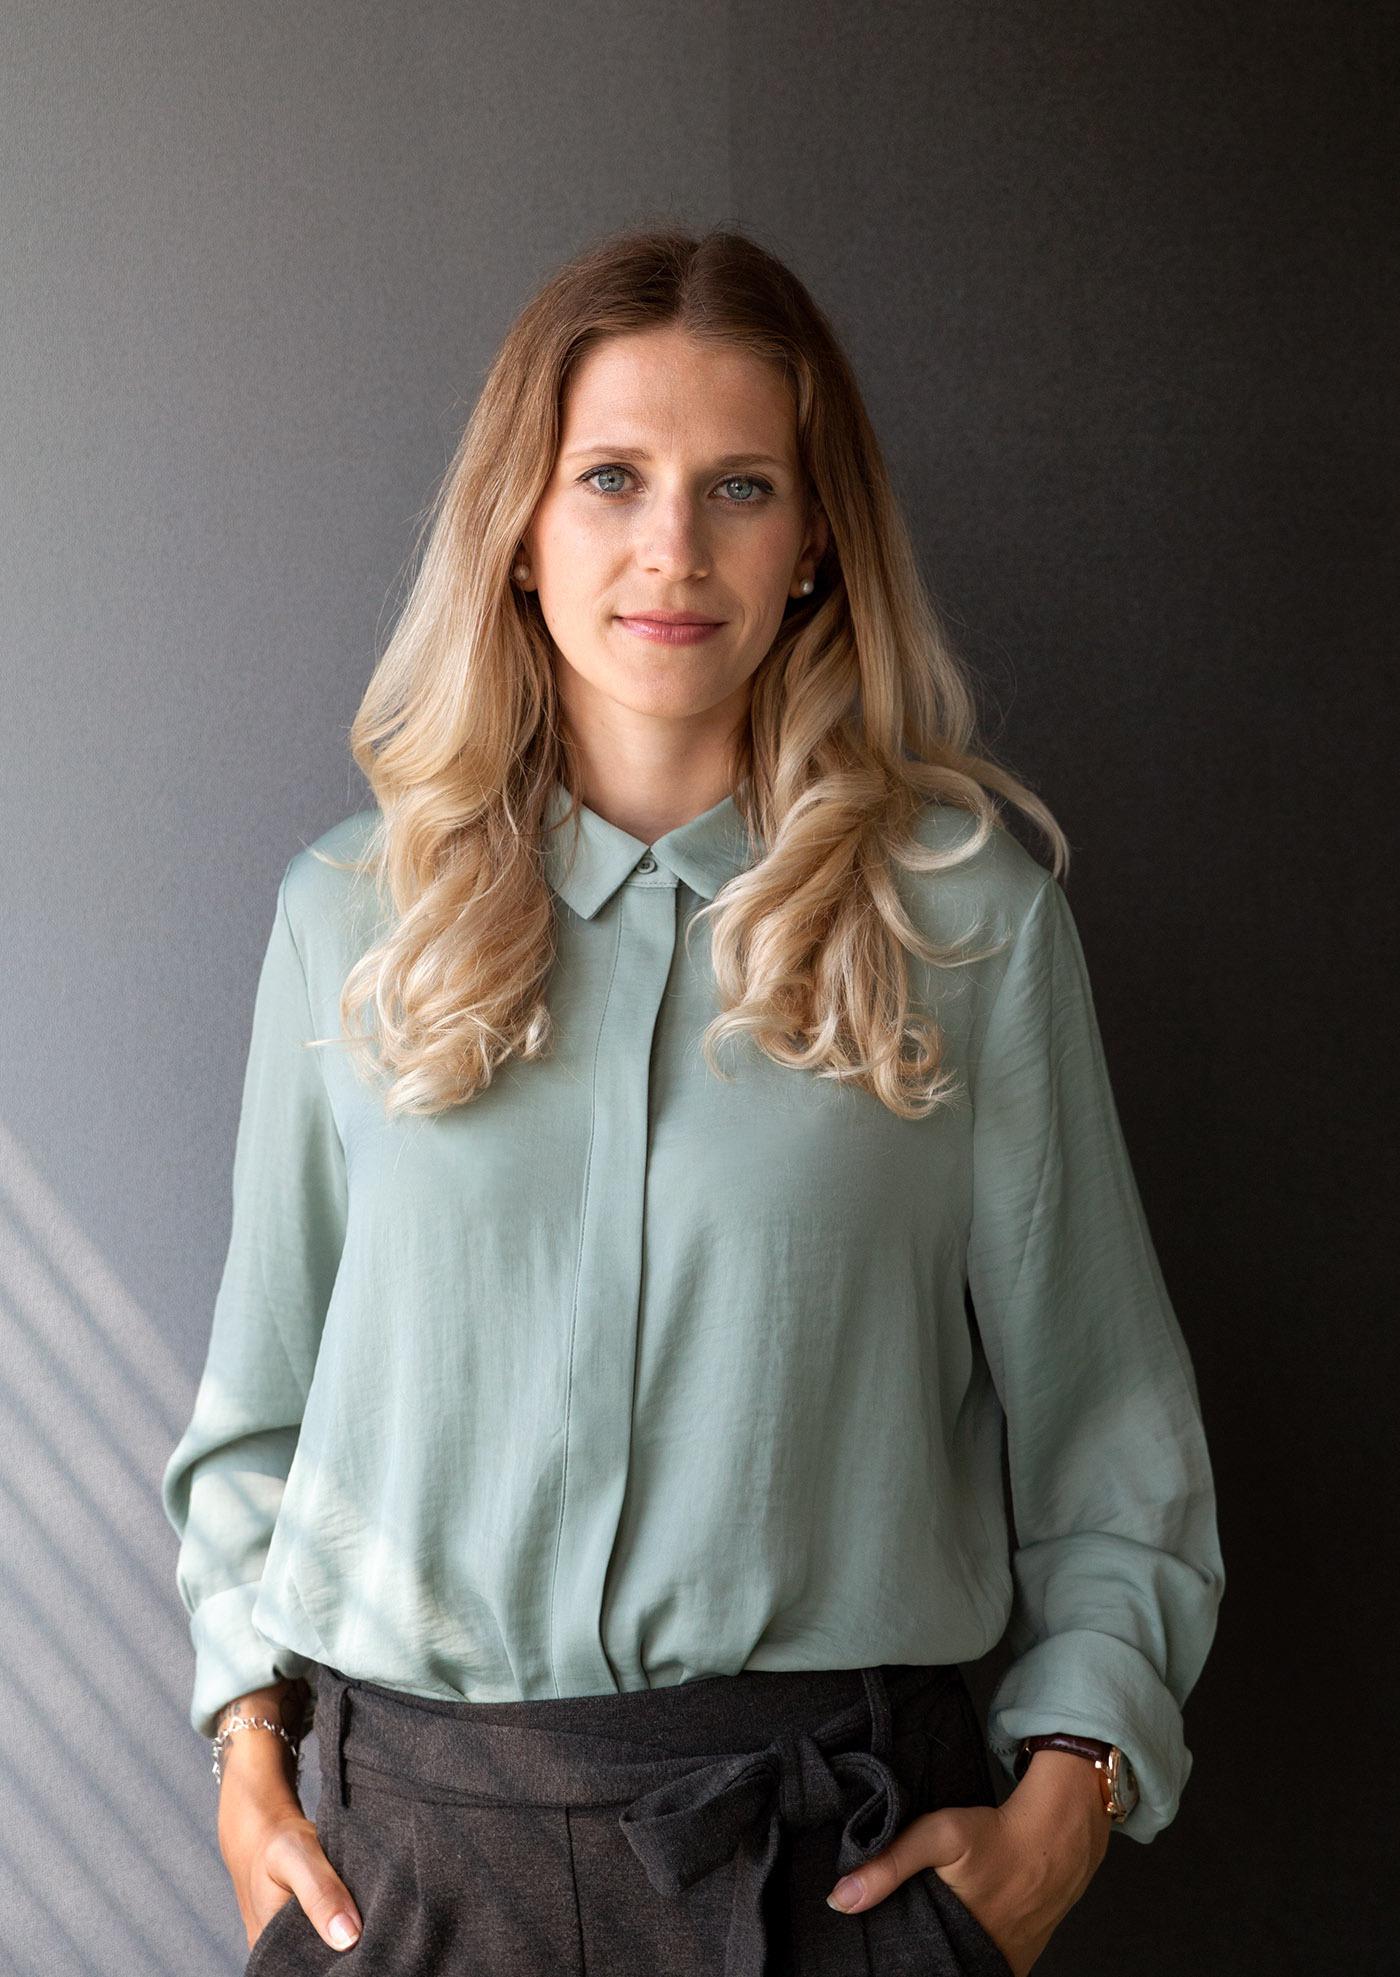 Stephanie Heller